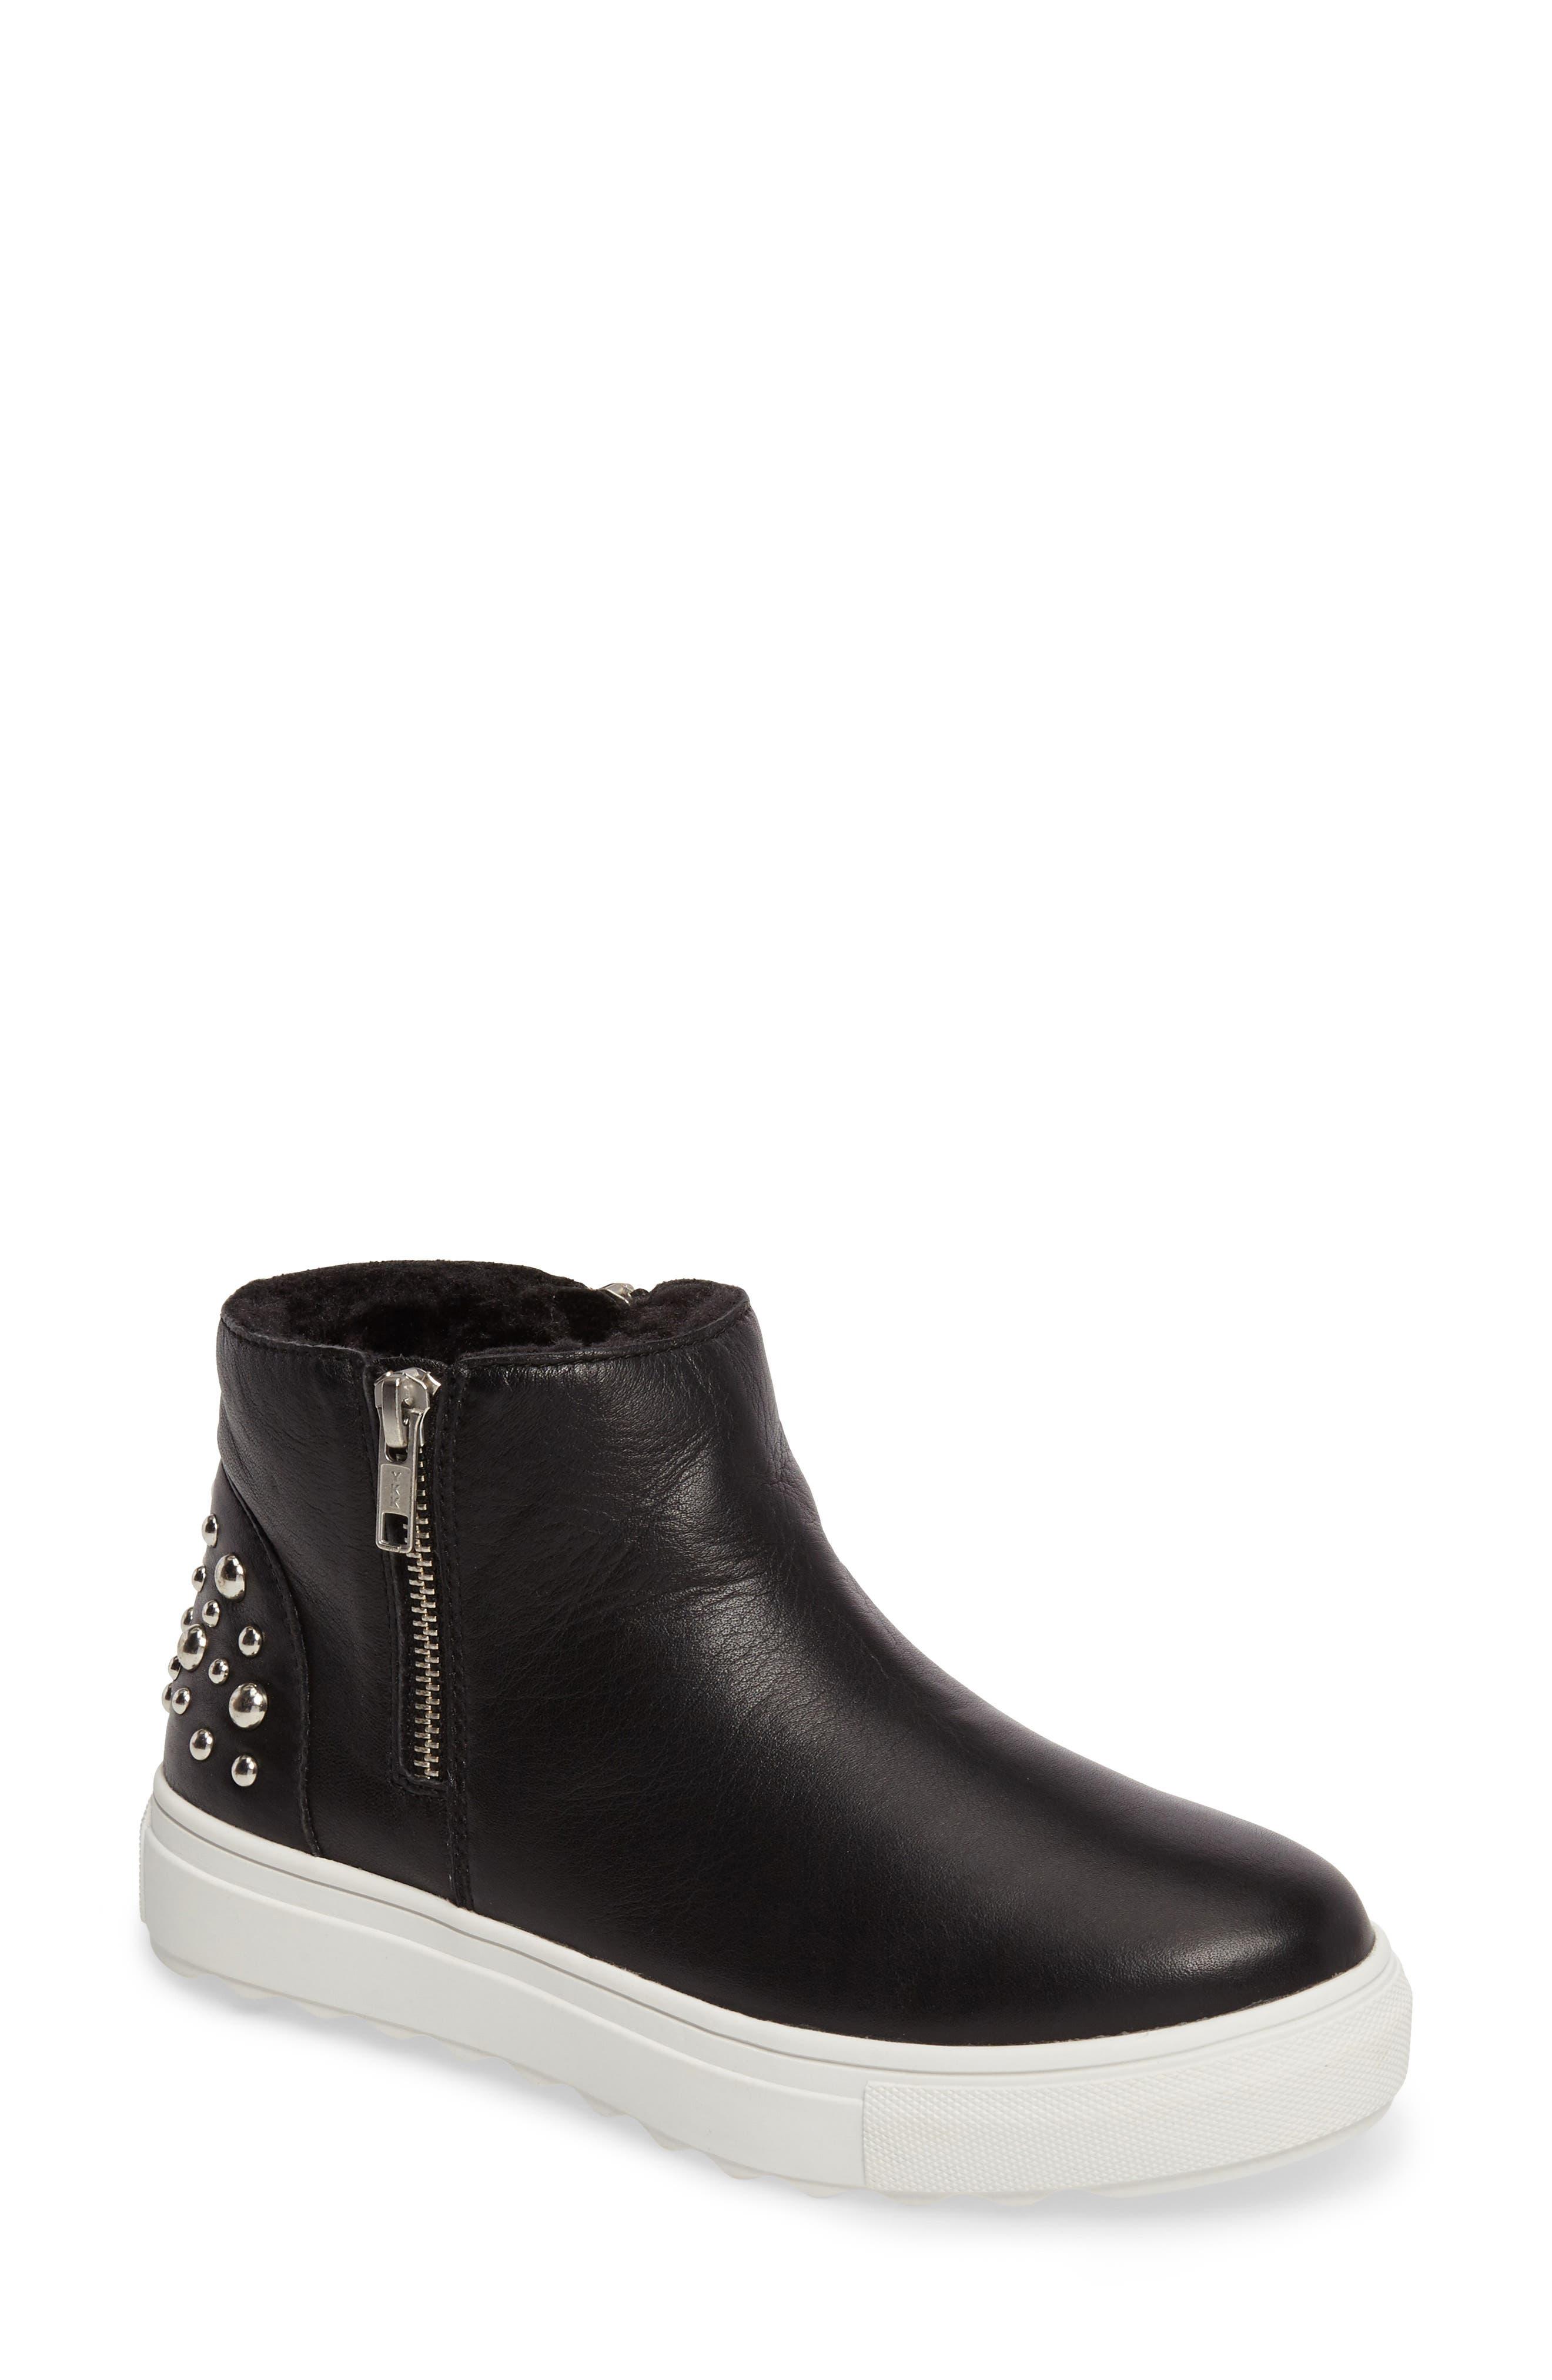 Pele Boot,                         Main,                         color, Black Leather